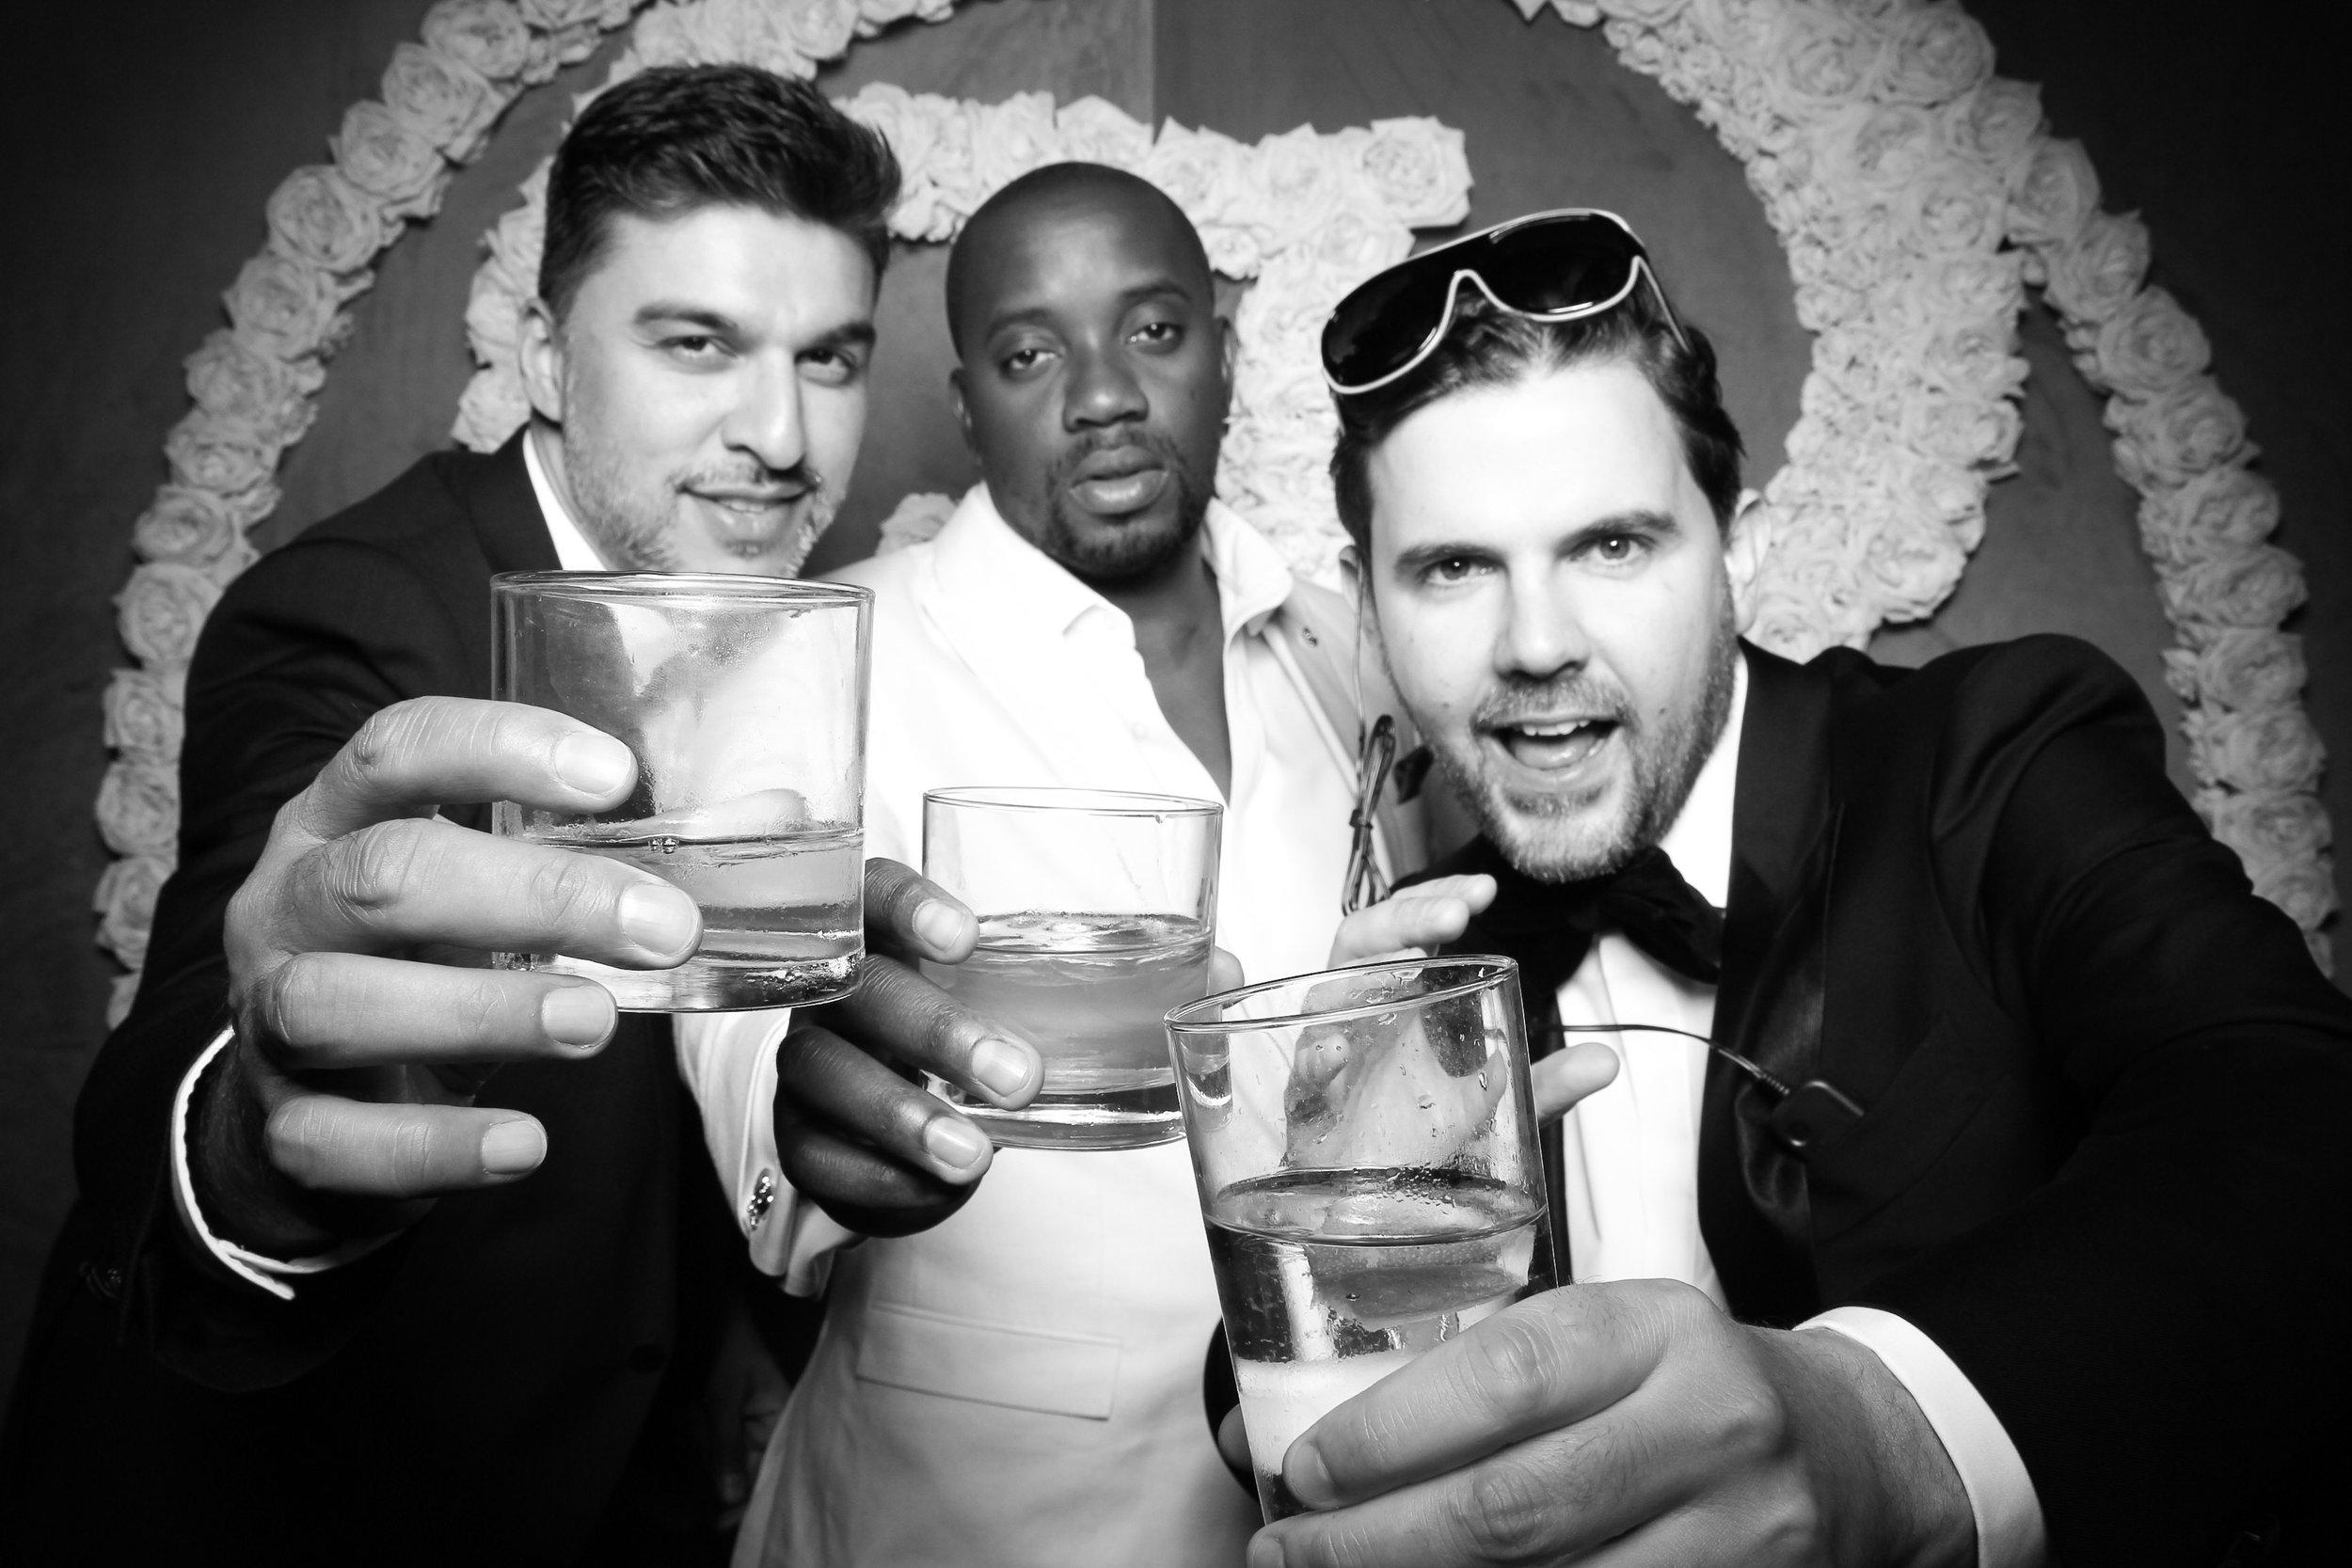 Photo_Booth_Rental_At_Standard_Club_Wedding_Chicago_17.jpg